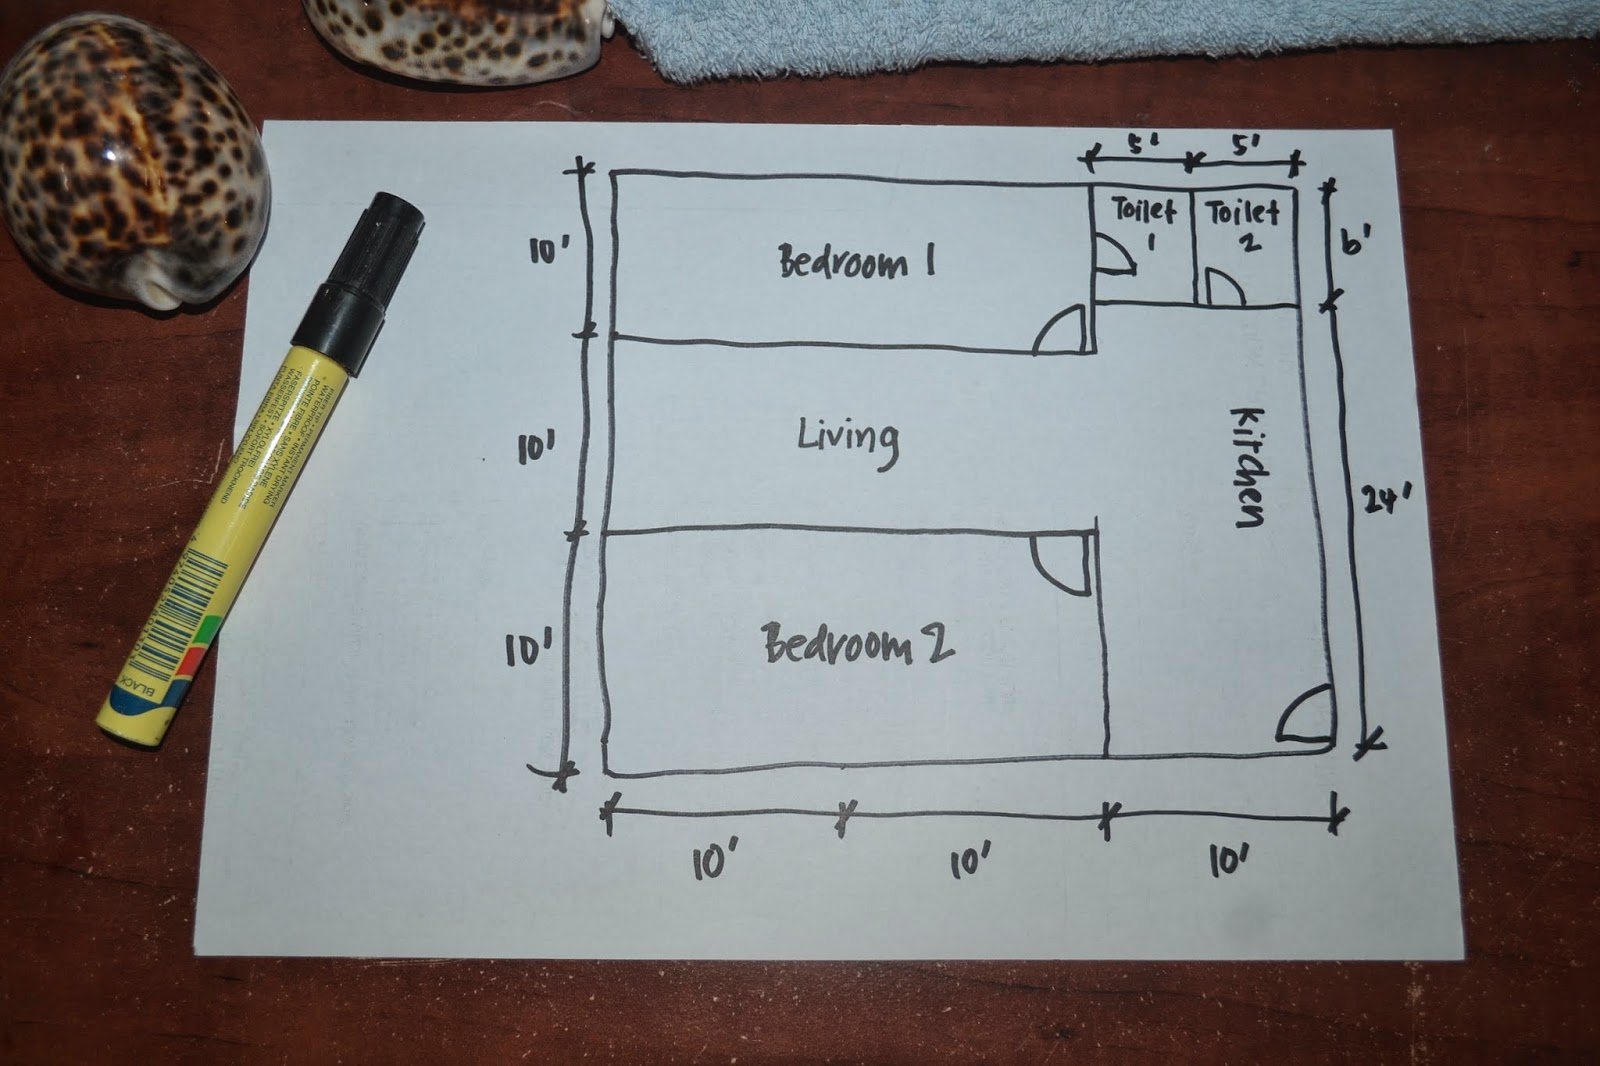 Ruang Tamu Dan Dapur Makan Keluasan 30 Jurnal Kehin Saya Rumah Impian Kabin 9